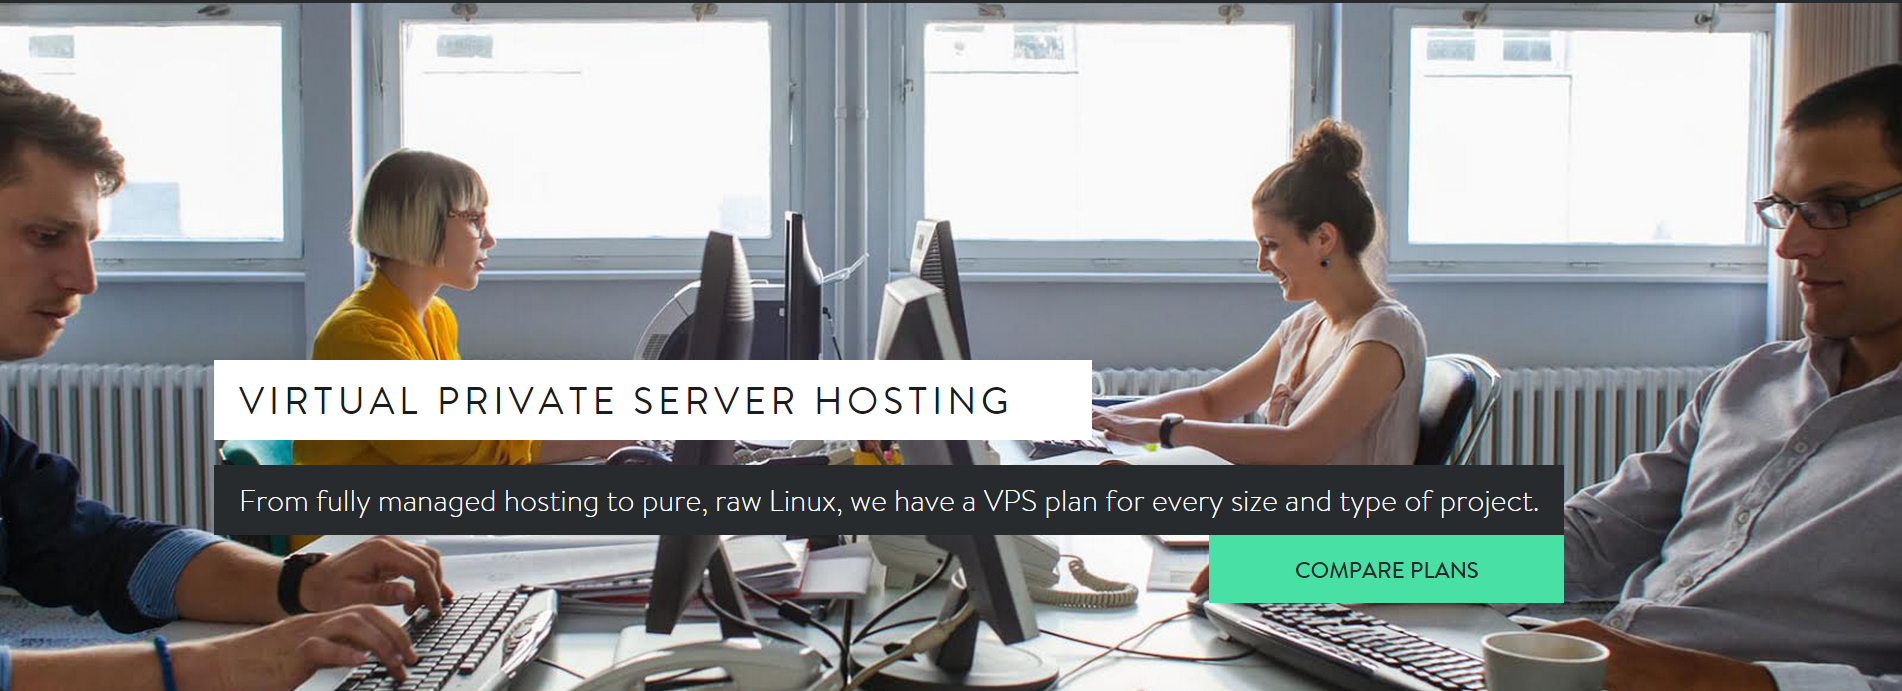 Media Temple Coupon Codes - hosting plan VPS Hosting